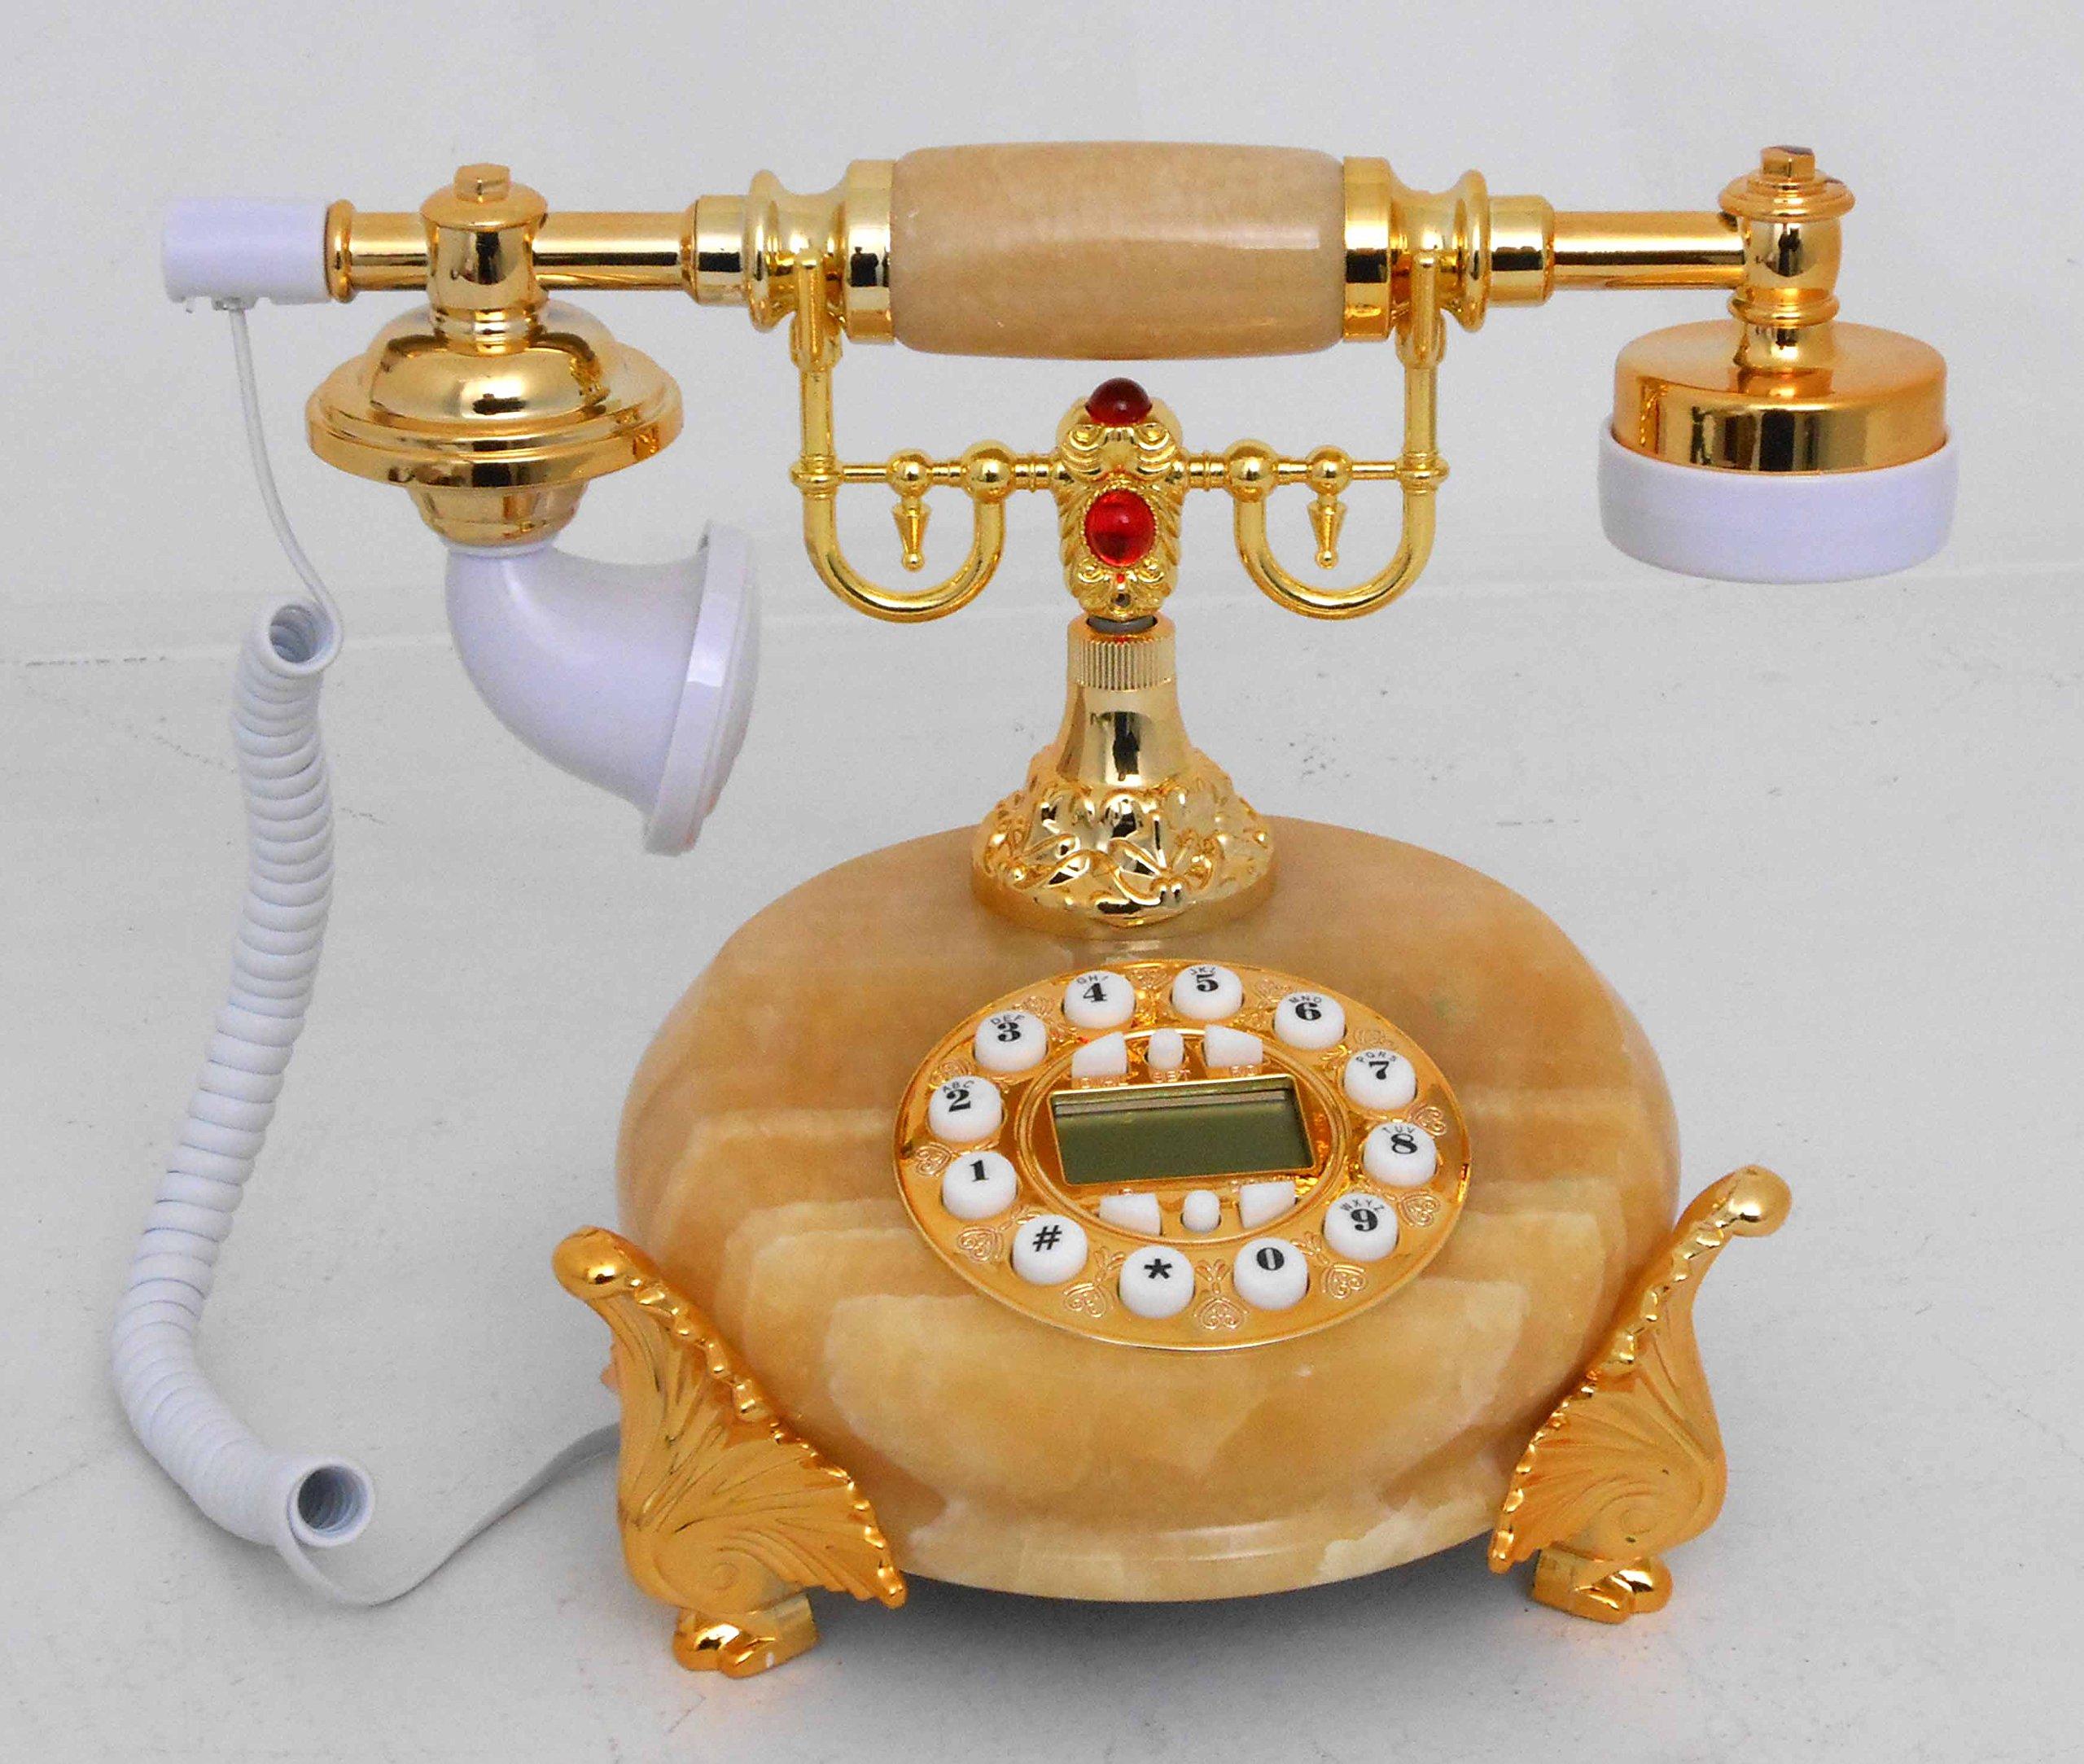 Retro style push button dial desk telephone (onyx) / Home decorative # 1719